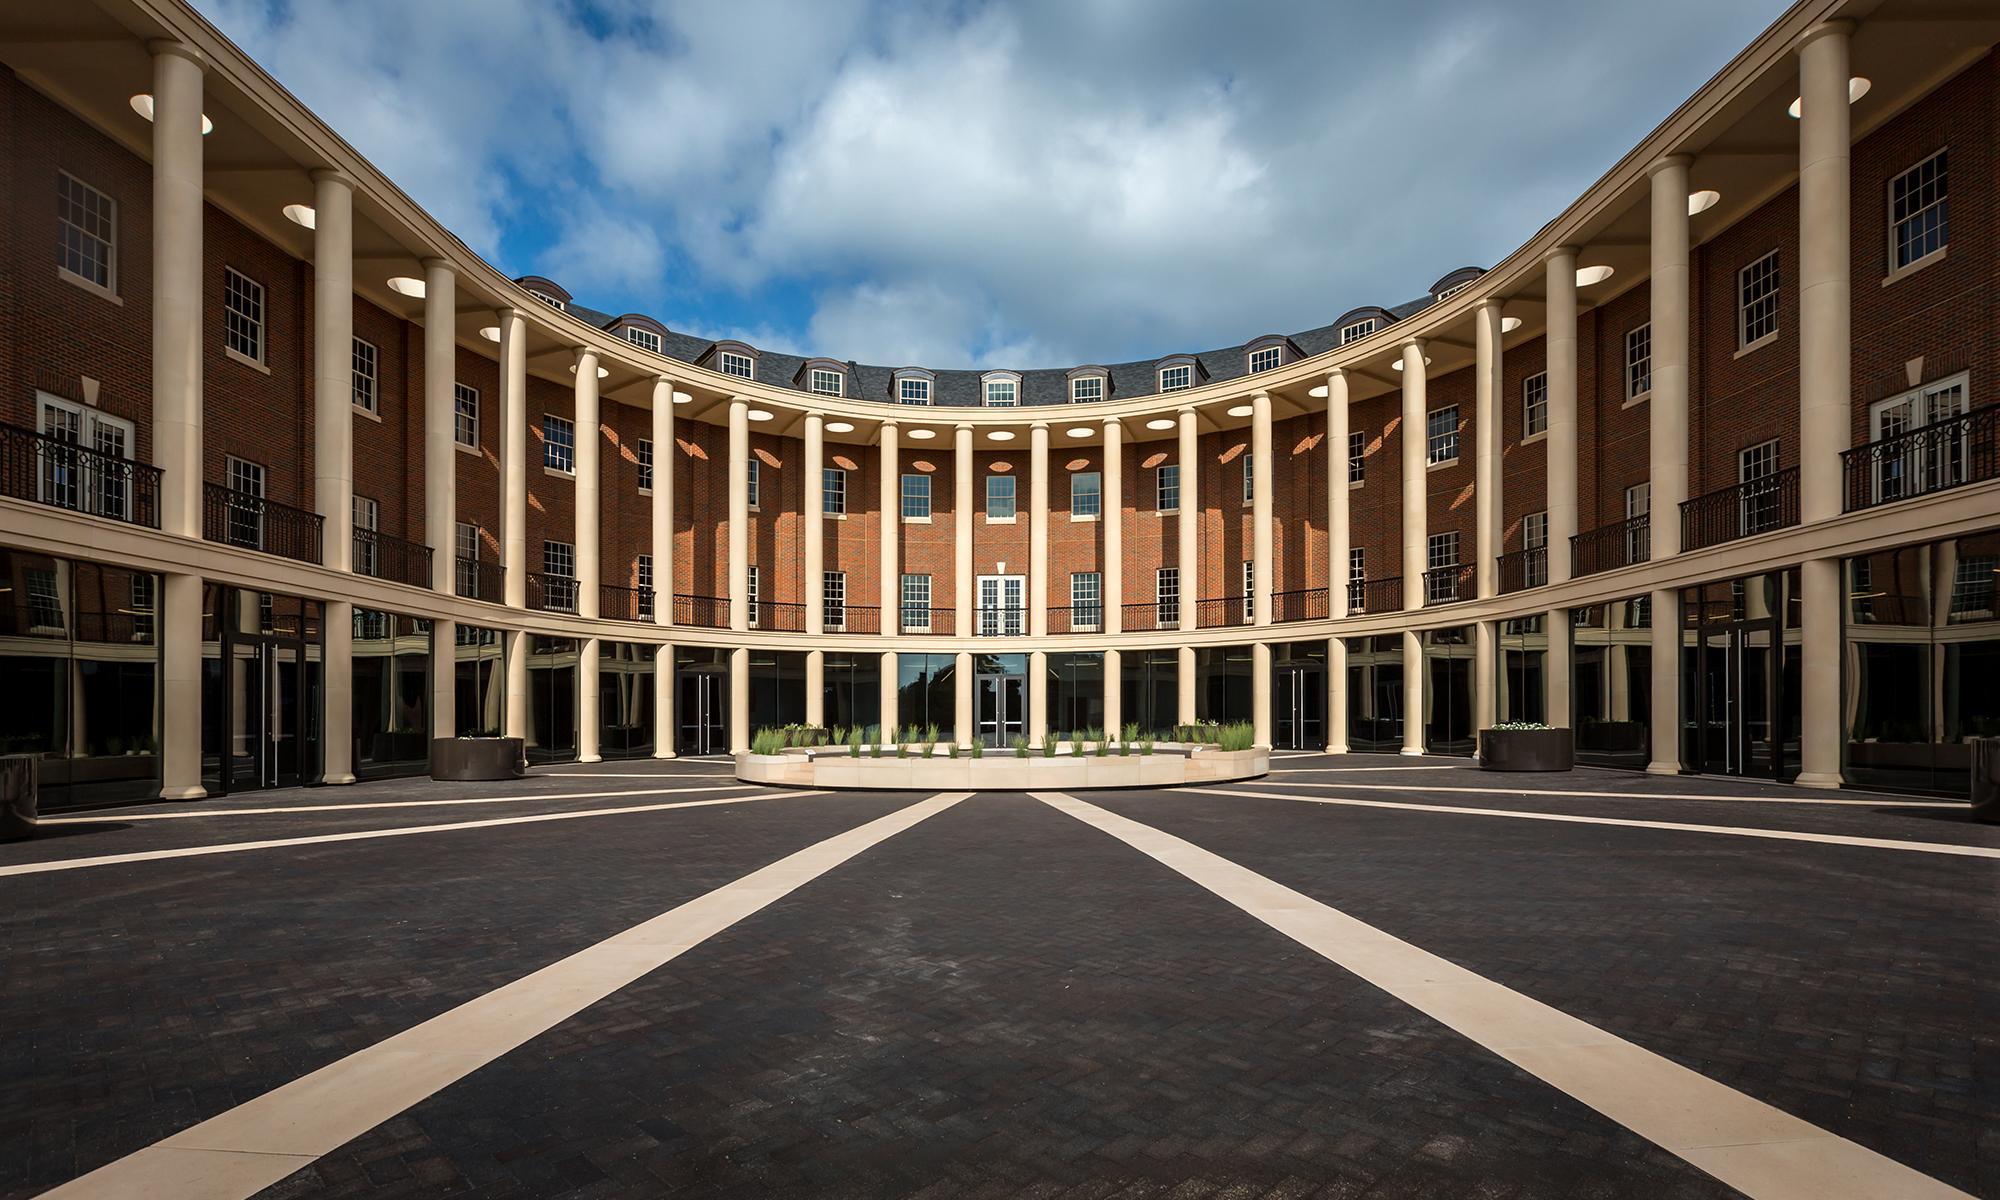 OSU Spears School of Business Courtyard